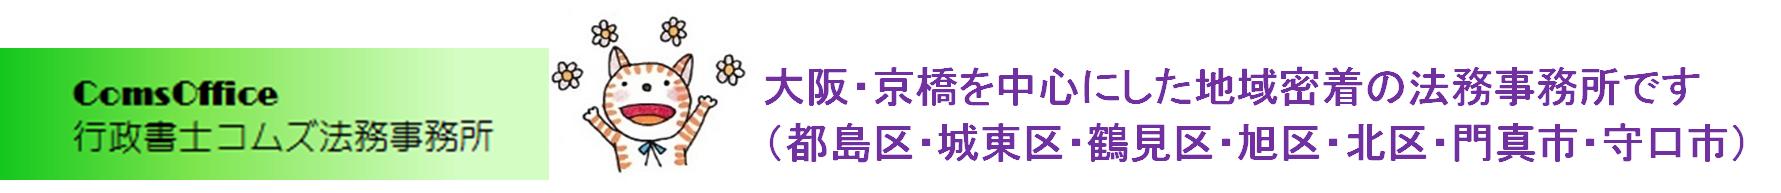 大阪・京橋(都島区)行政書士コムズ★オフィス 福祉・国際・相続・離婚・契約書・内容証明